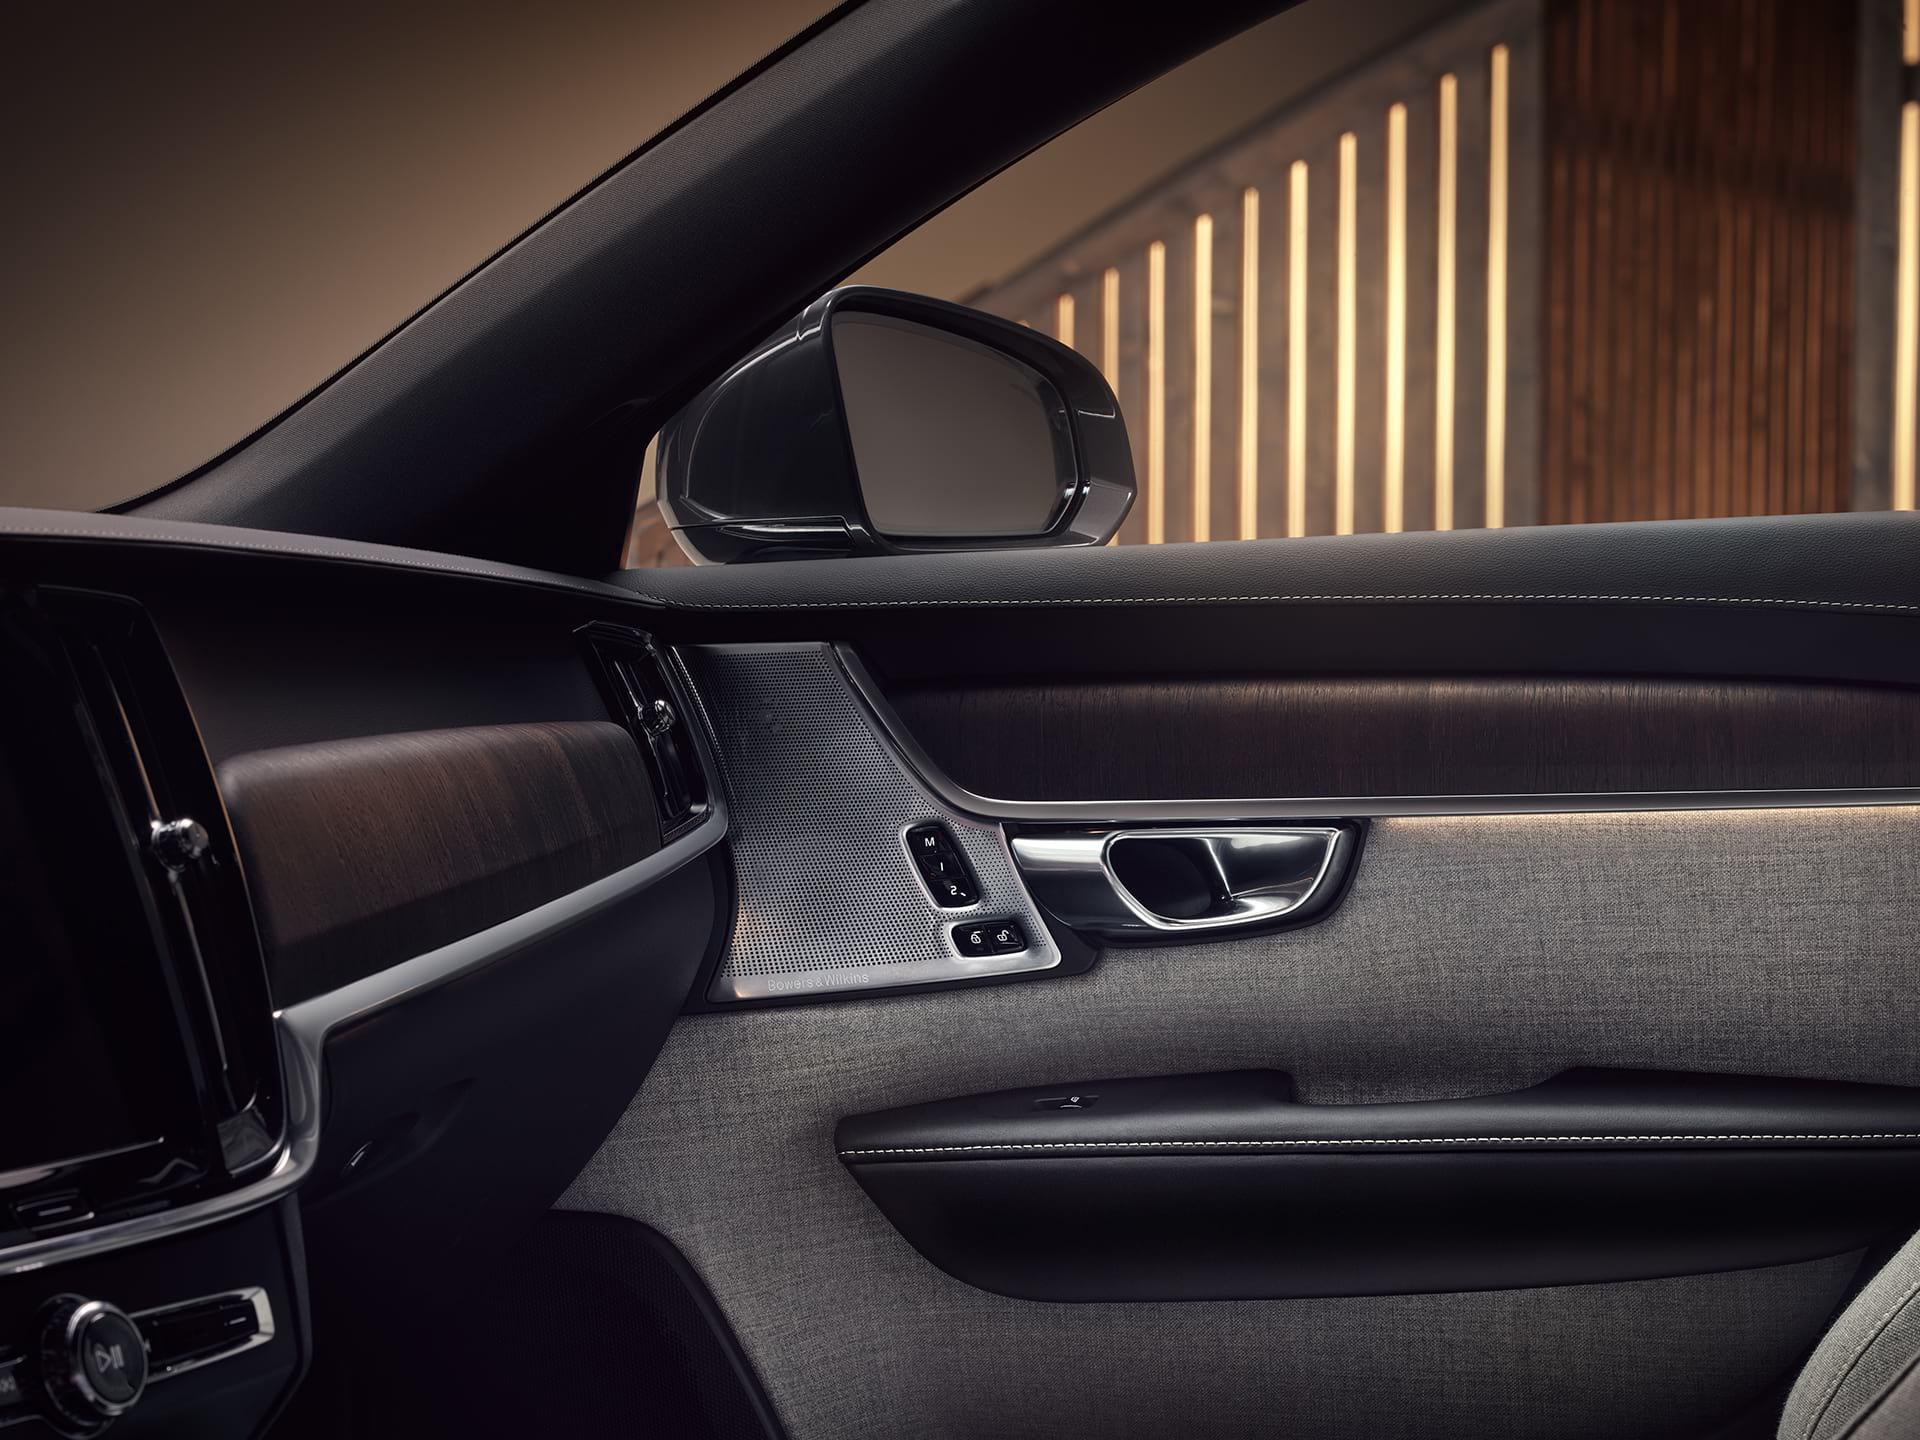 Tilpasset lys i passasjersetet til en Volvo V90 Recharge.